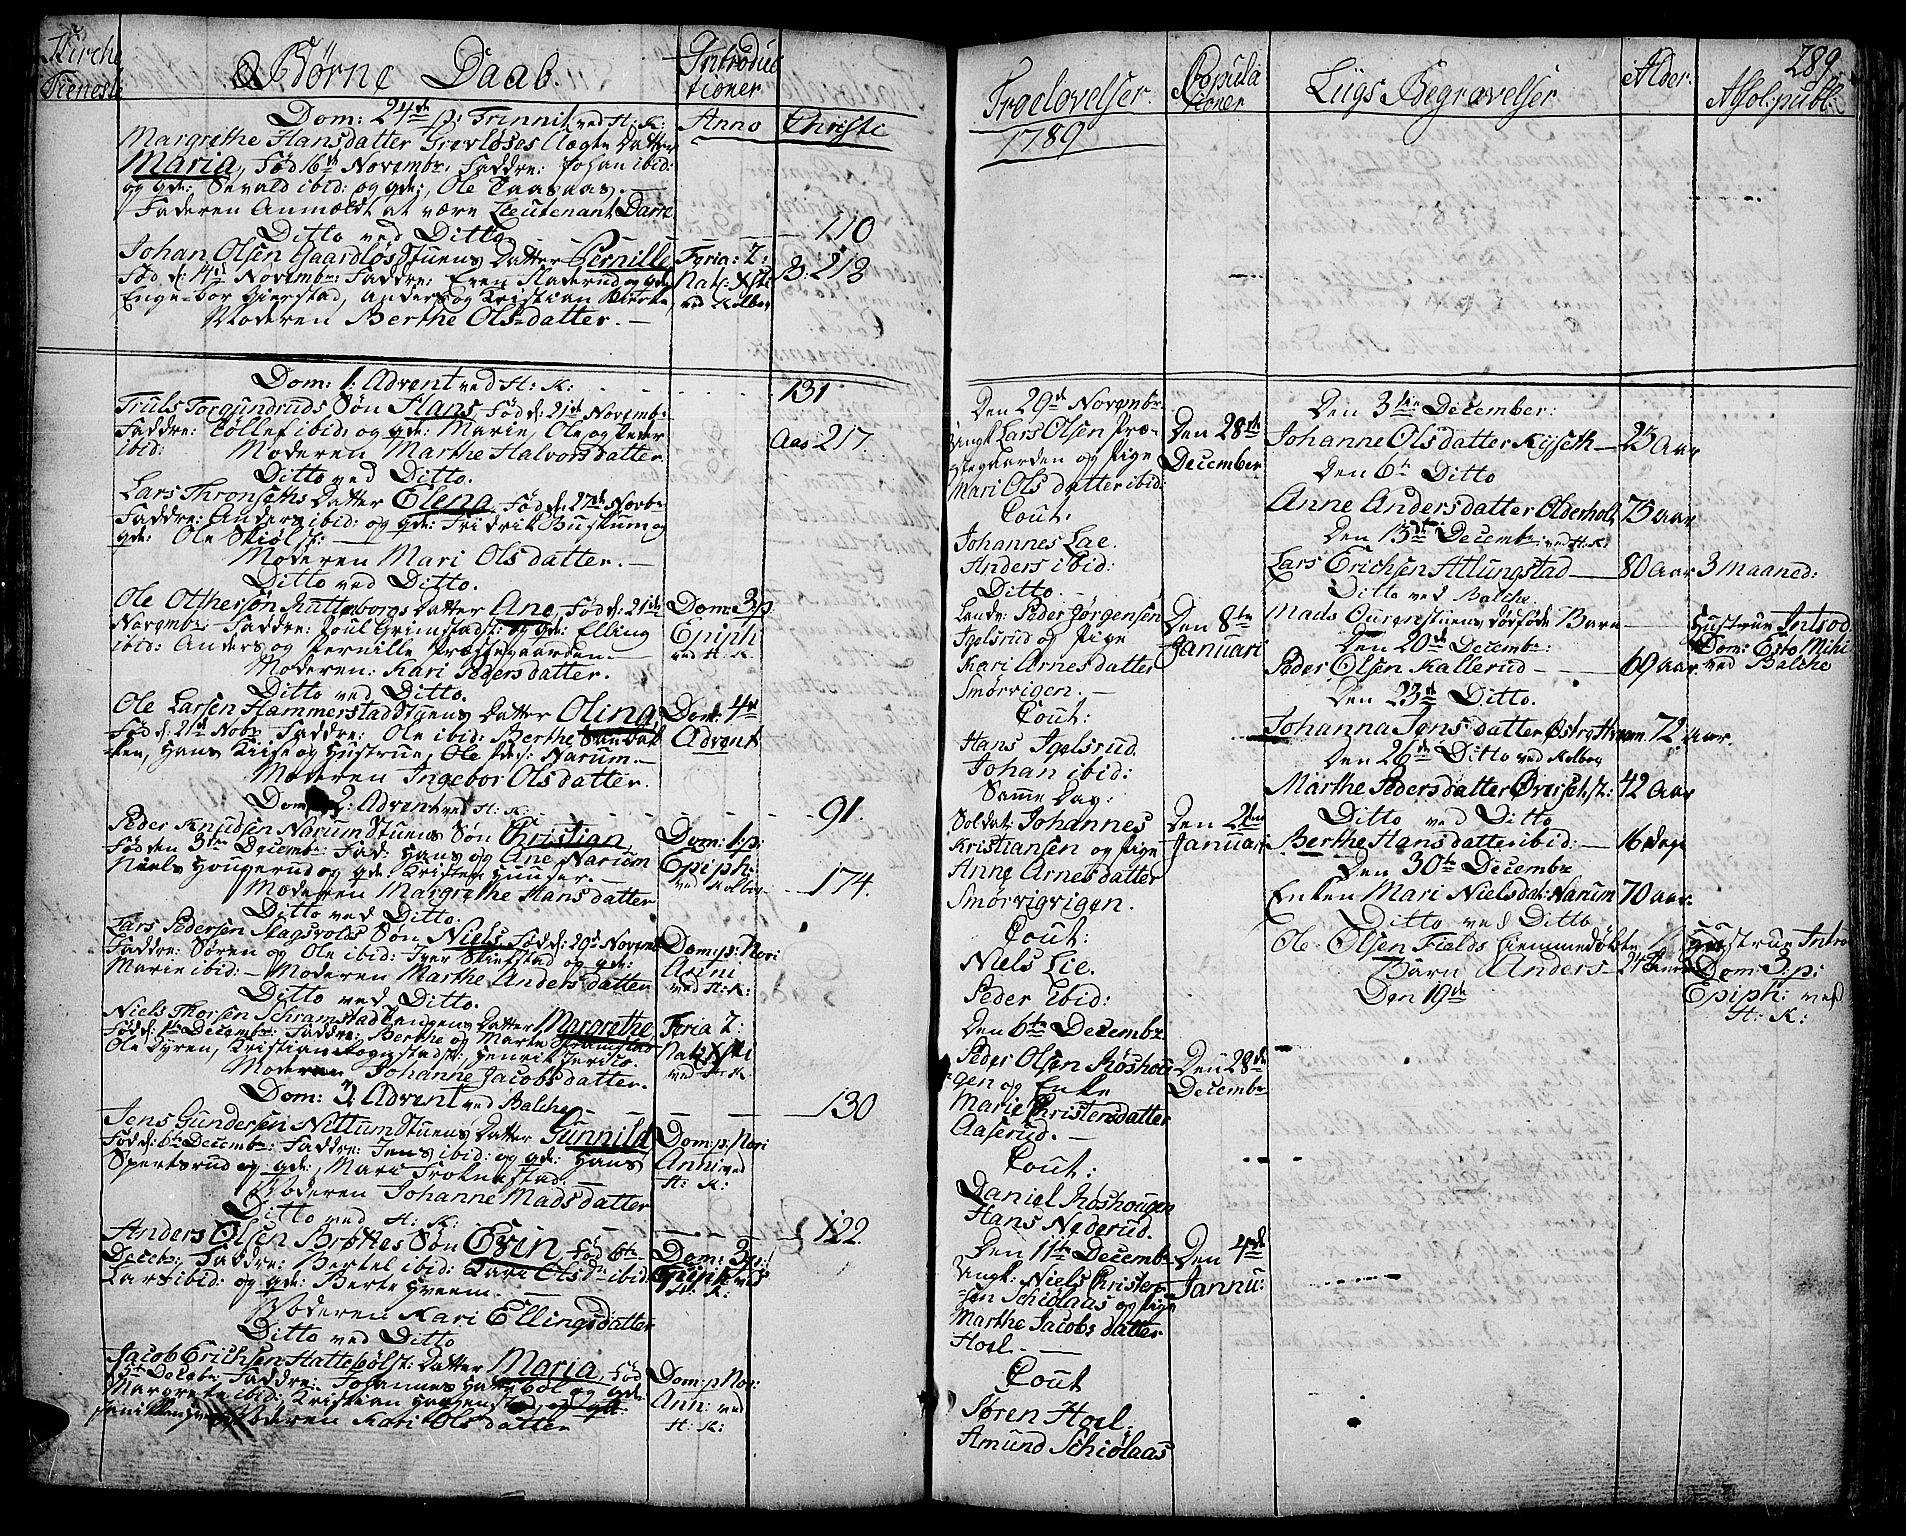 SAH, Toten prestekontor, Ministerialbok nr. 6, 1773-1793, s. 289